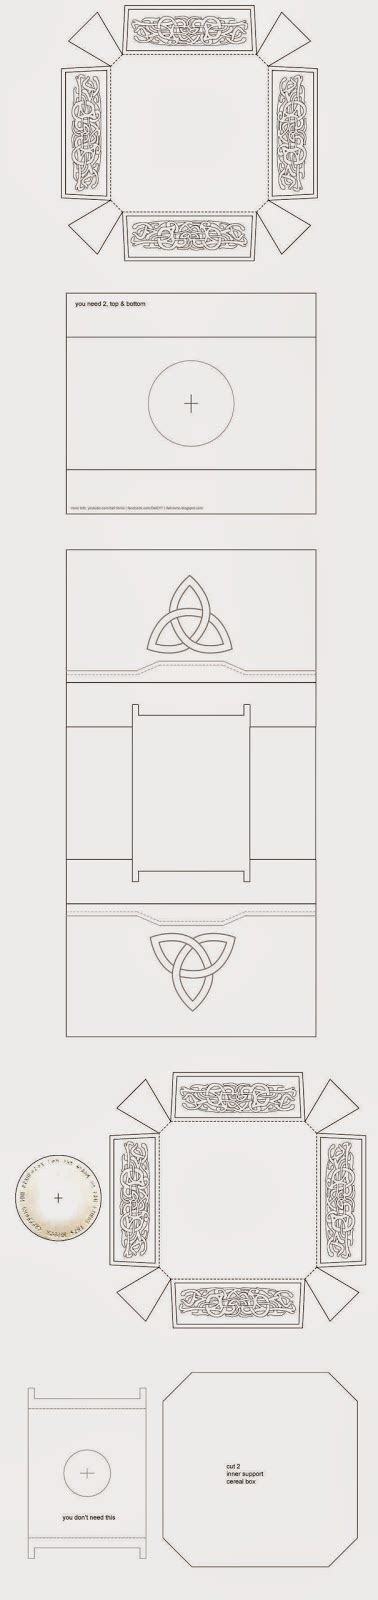 Dali Lomo Thor Hammer Mj 246 Lnir Cardboard Diy Free Template Thor Hammer Printable Template